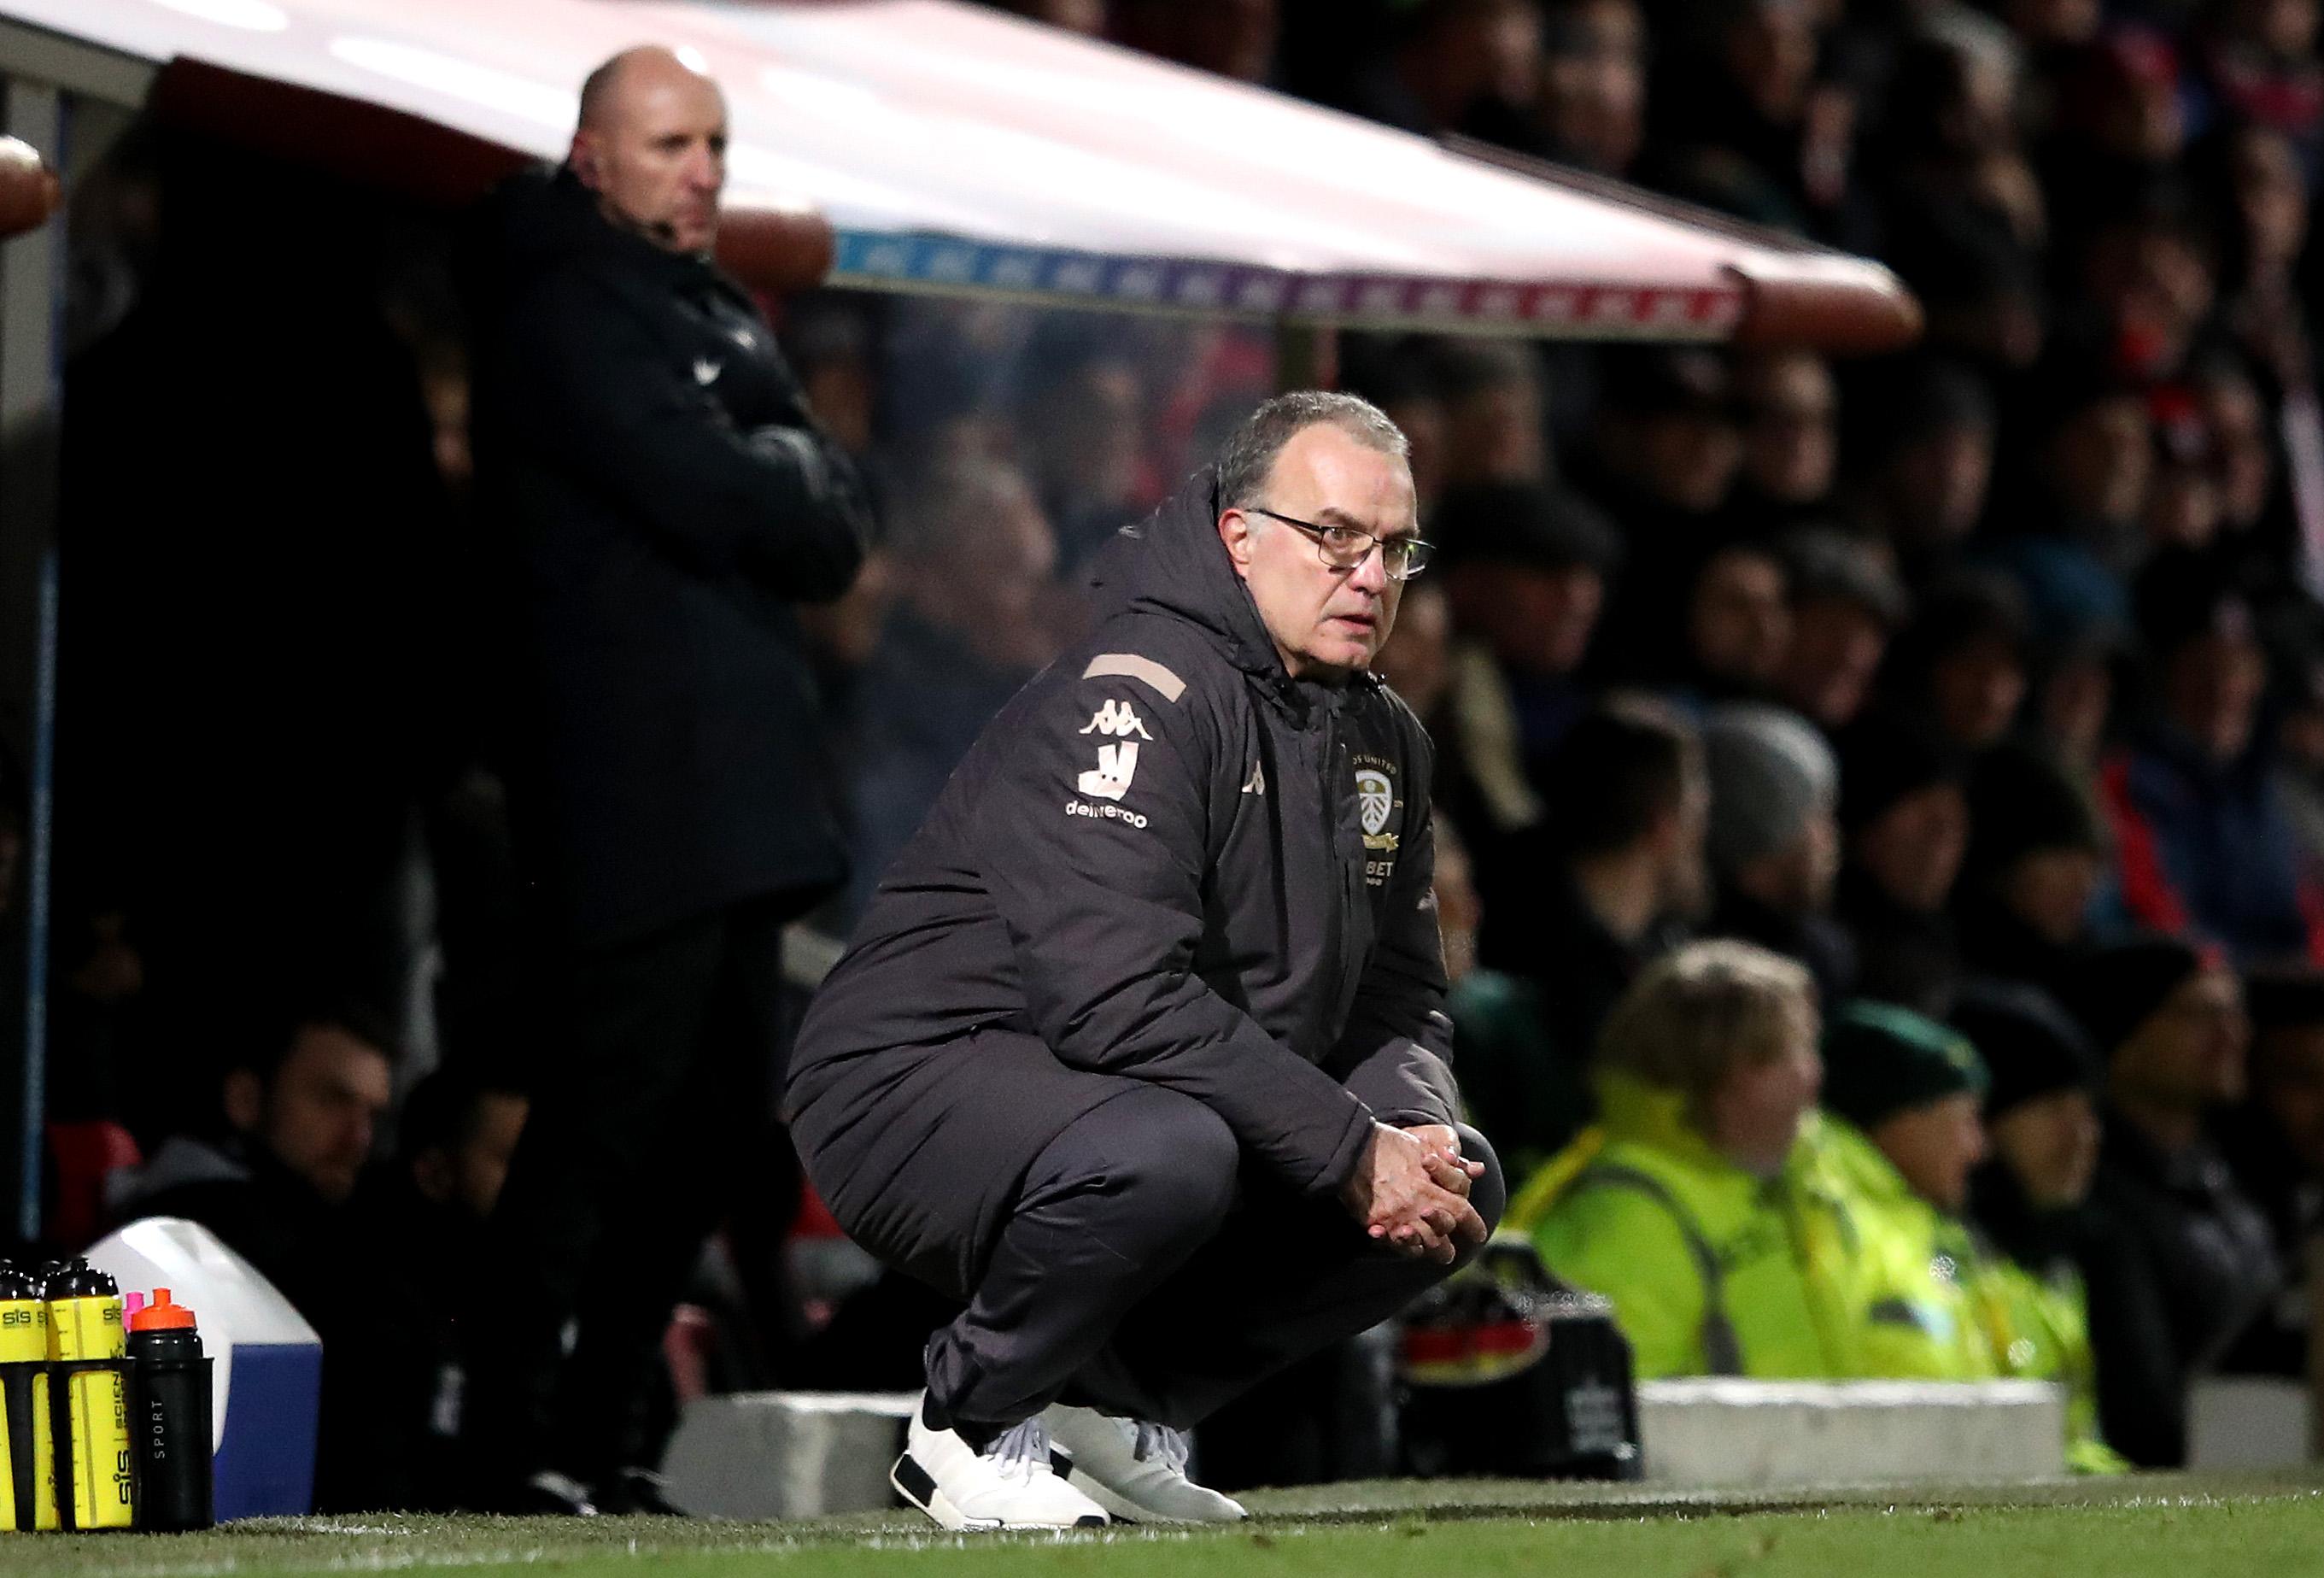 Predicted Leeds United Lineup Vs Stoke City - Marcelo Bielsa to remain unchanged.